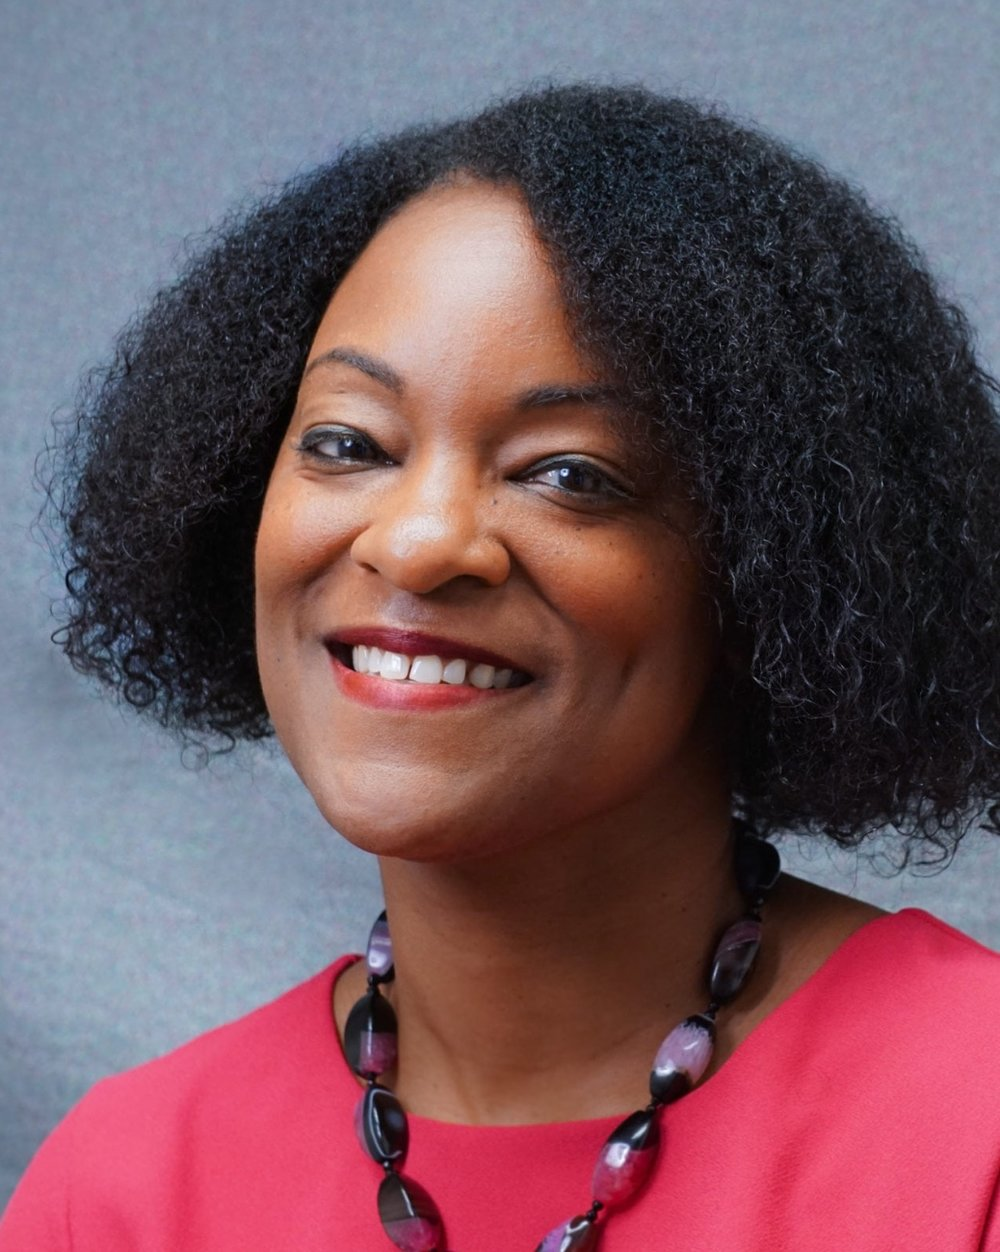 Elisha Smith Arrillaga, co-interim executive director of Education Trust—West